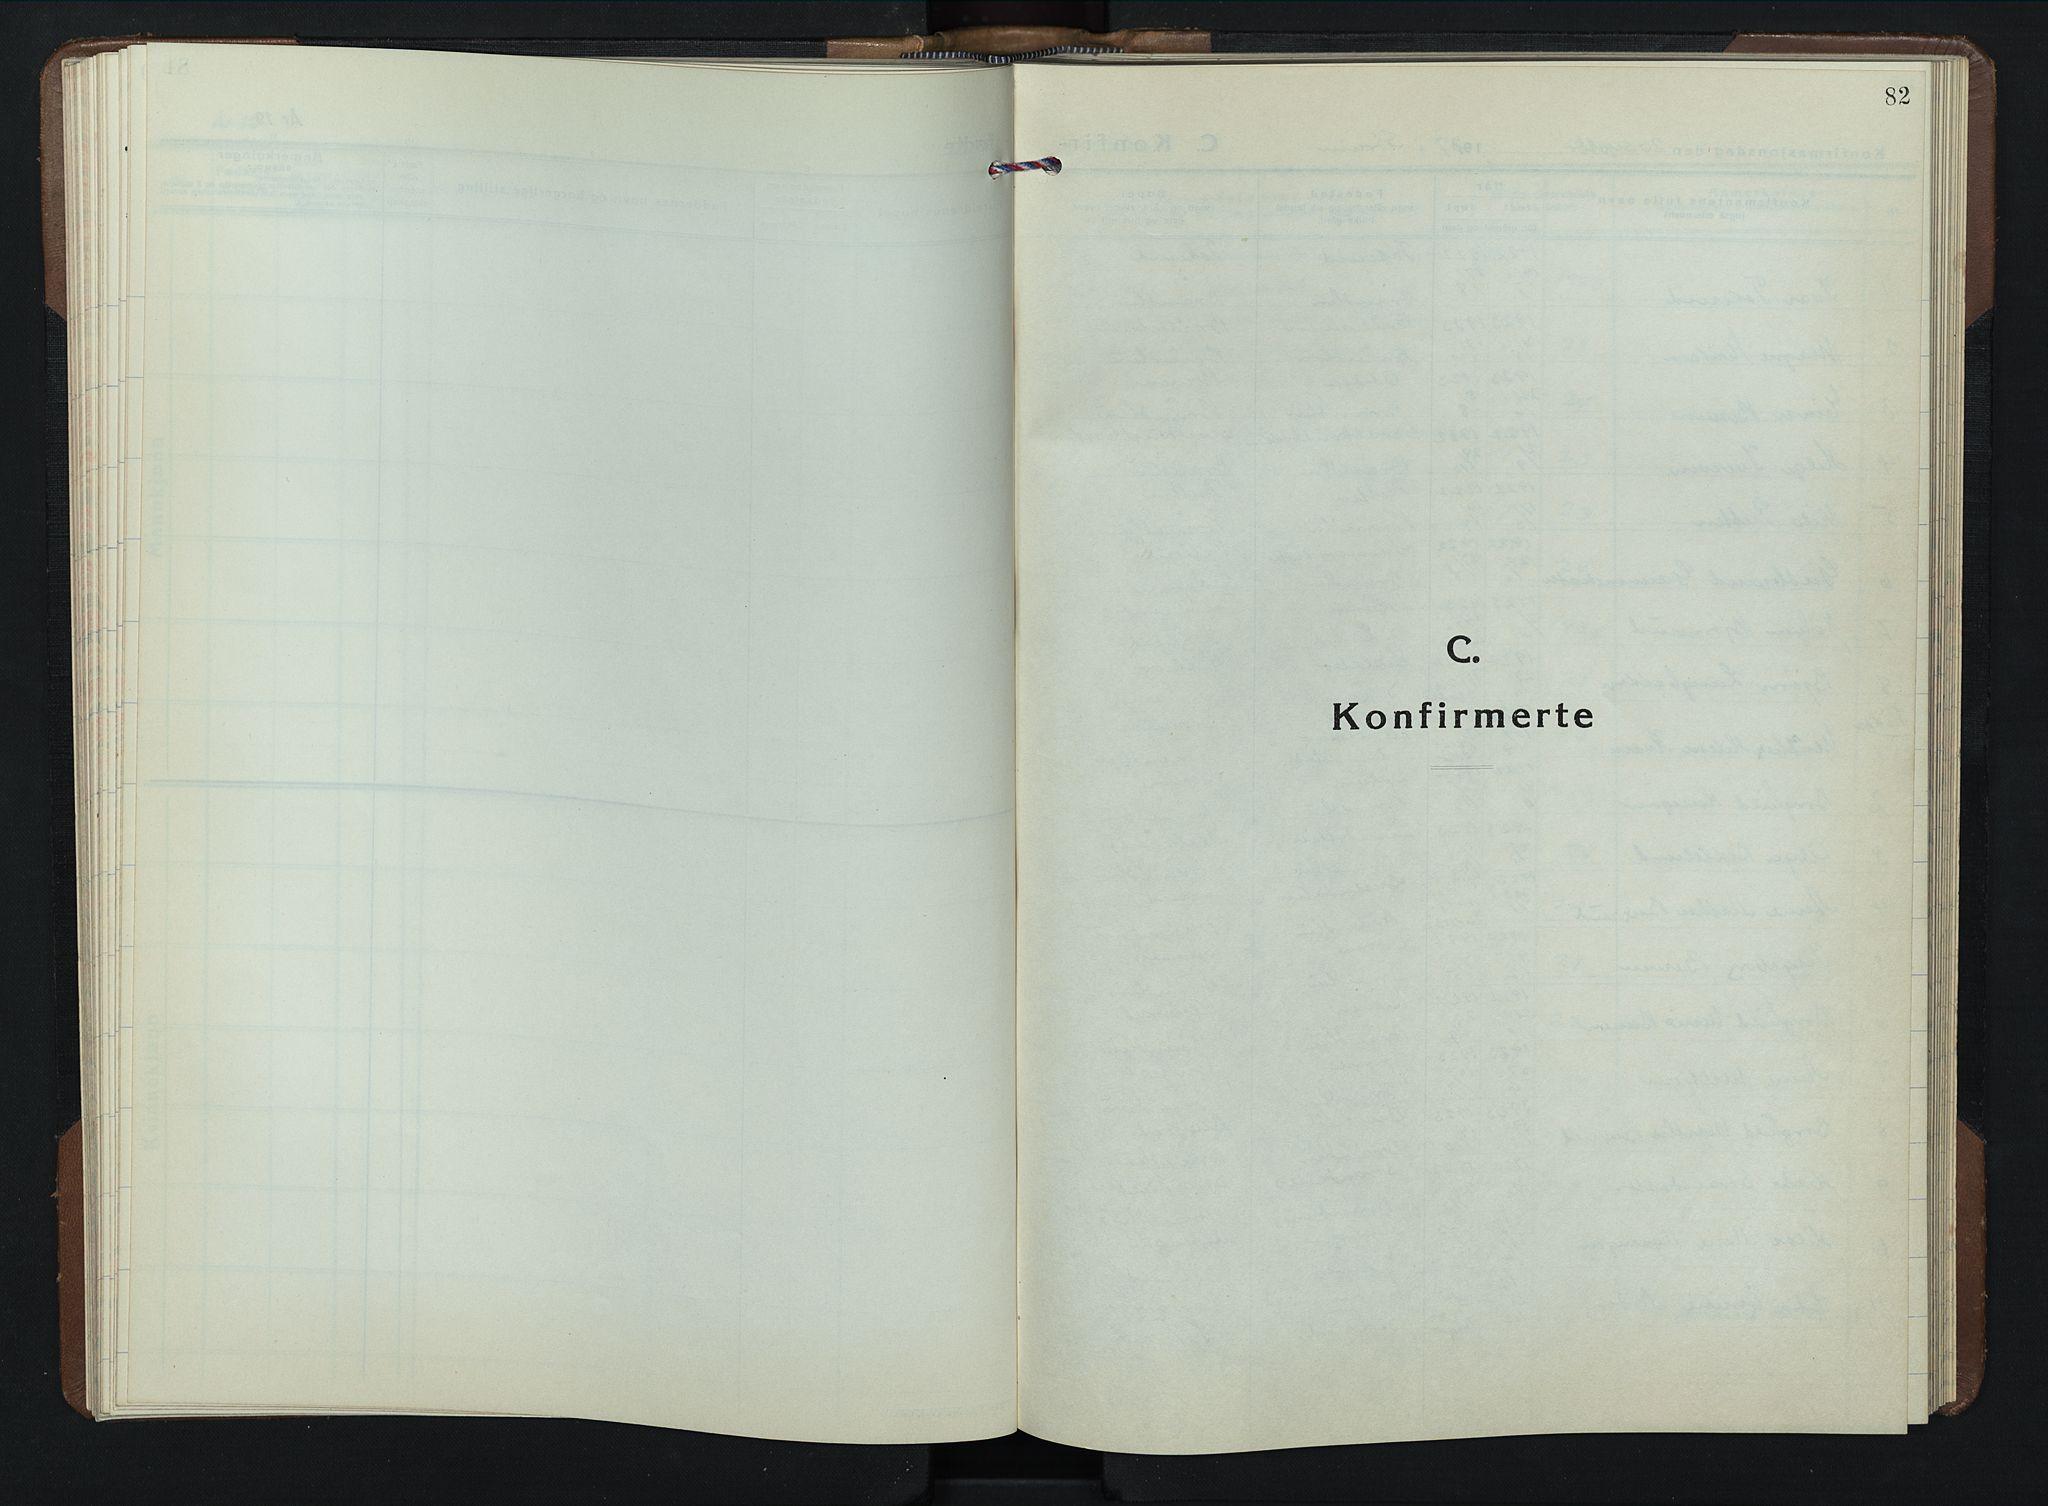 SAH, Brandbu prestekontor, Klokkerbok nr. 2, 1937-1953, s. 82